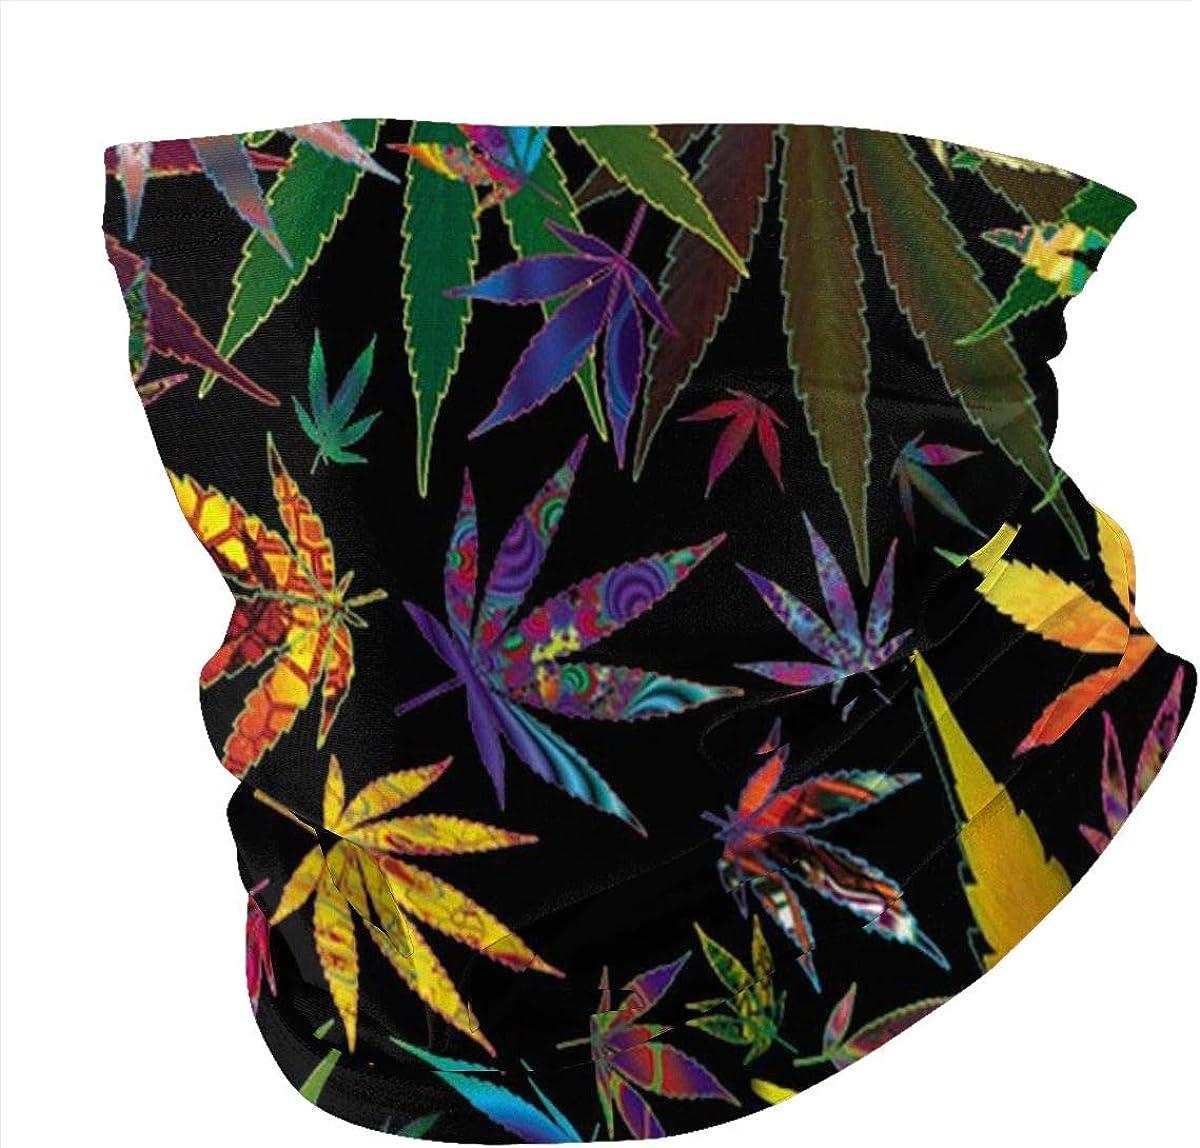 Colorful Marijuana Weed Seamless Bandana Neck Gaiter Mask Breathable Balaclava Sports & Casual Headwear Cycling Running Hiking Headband for Women and Men